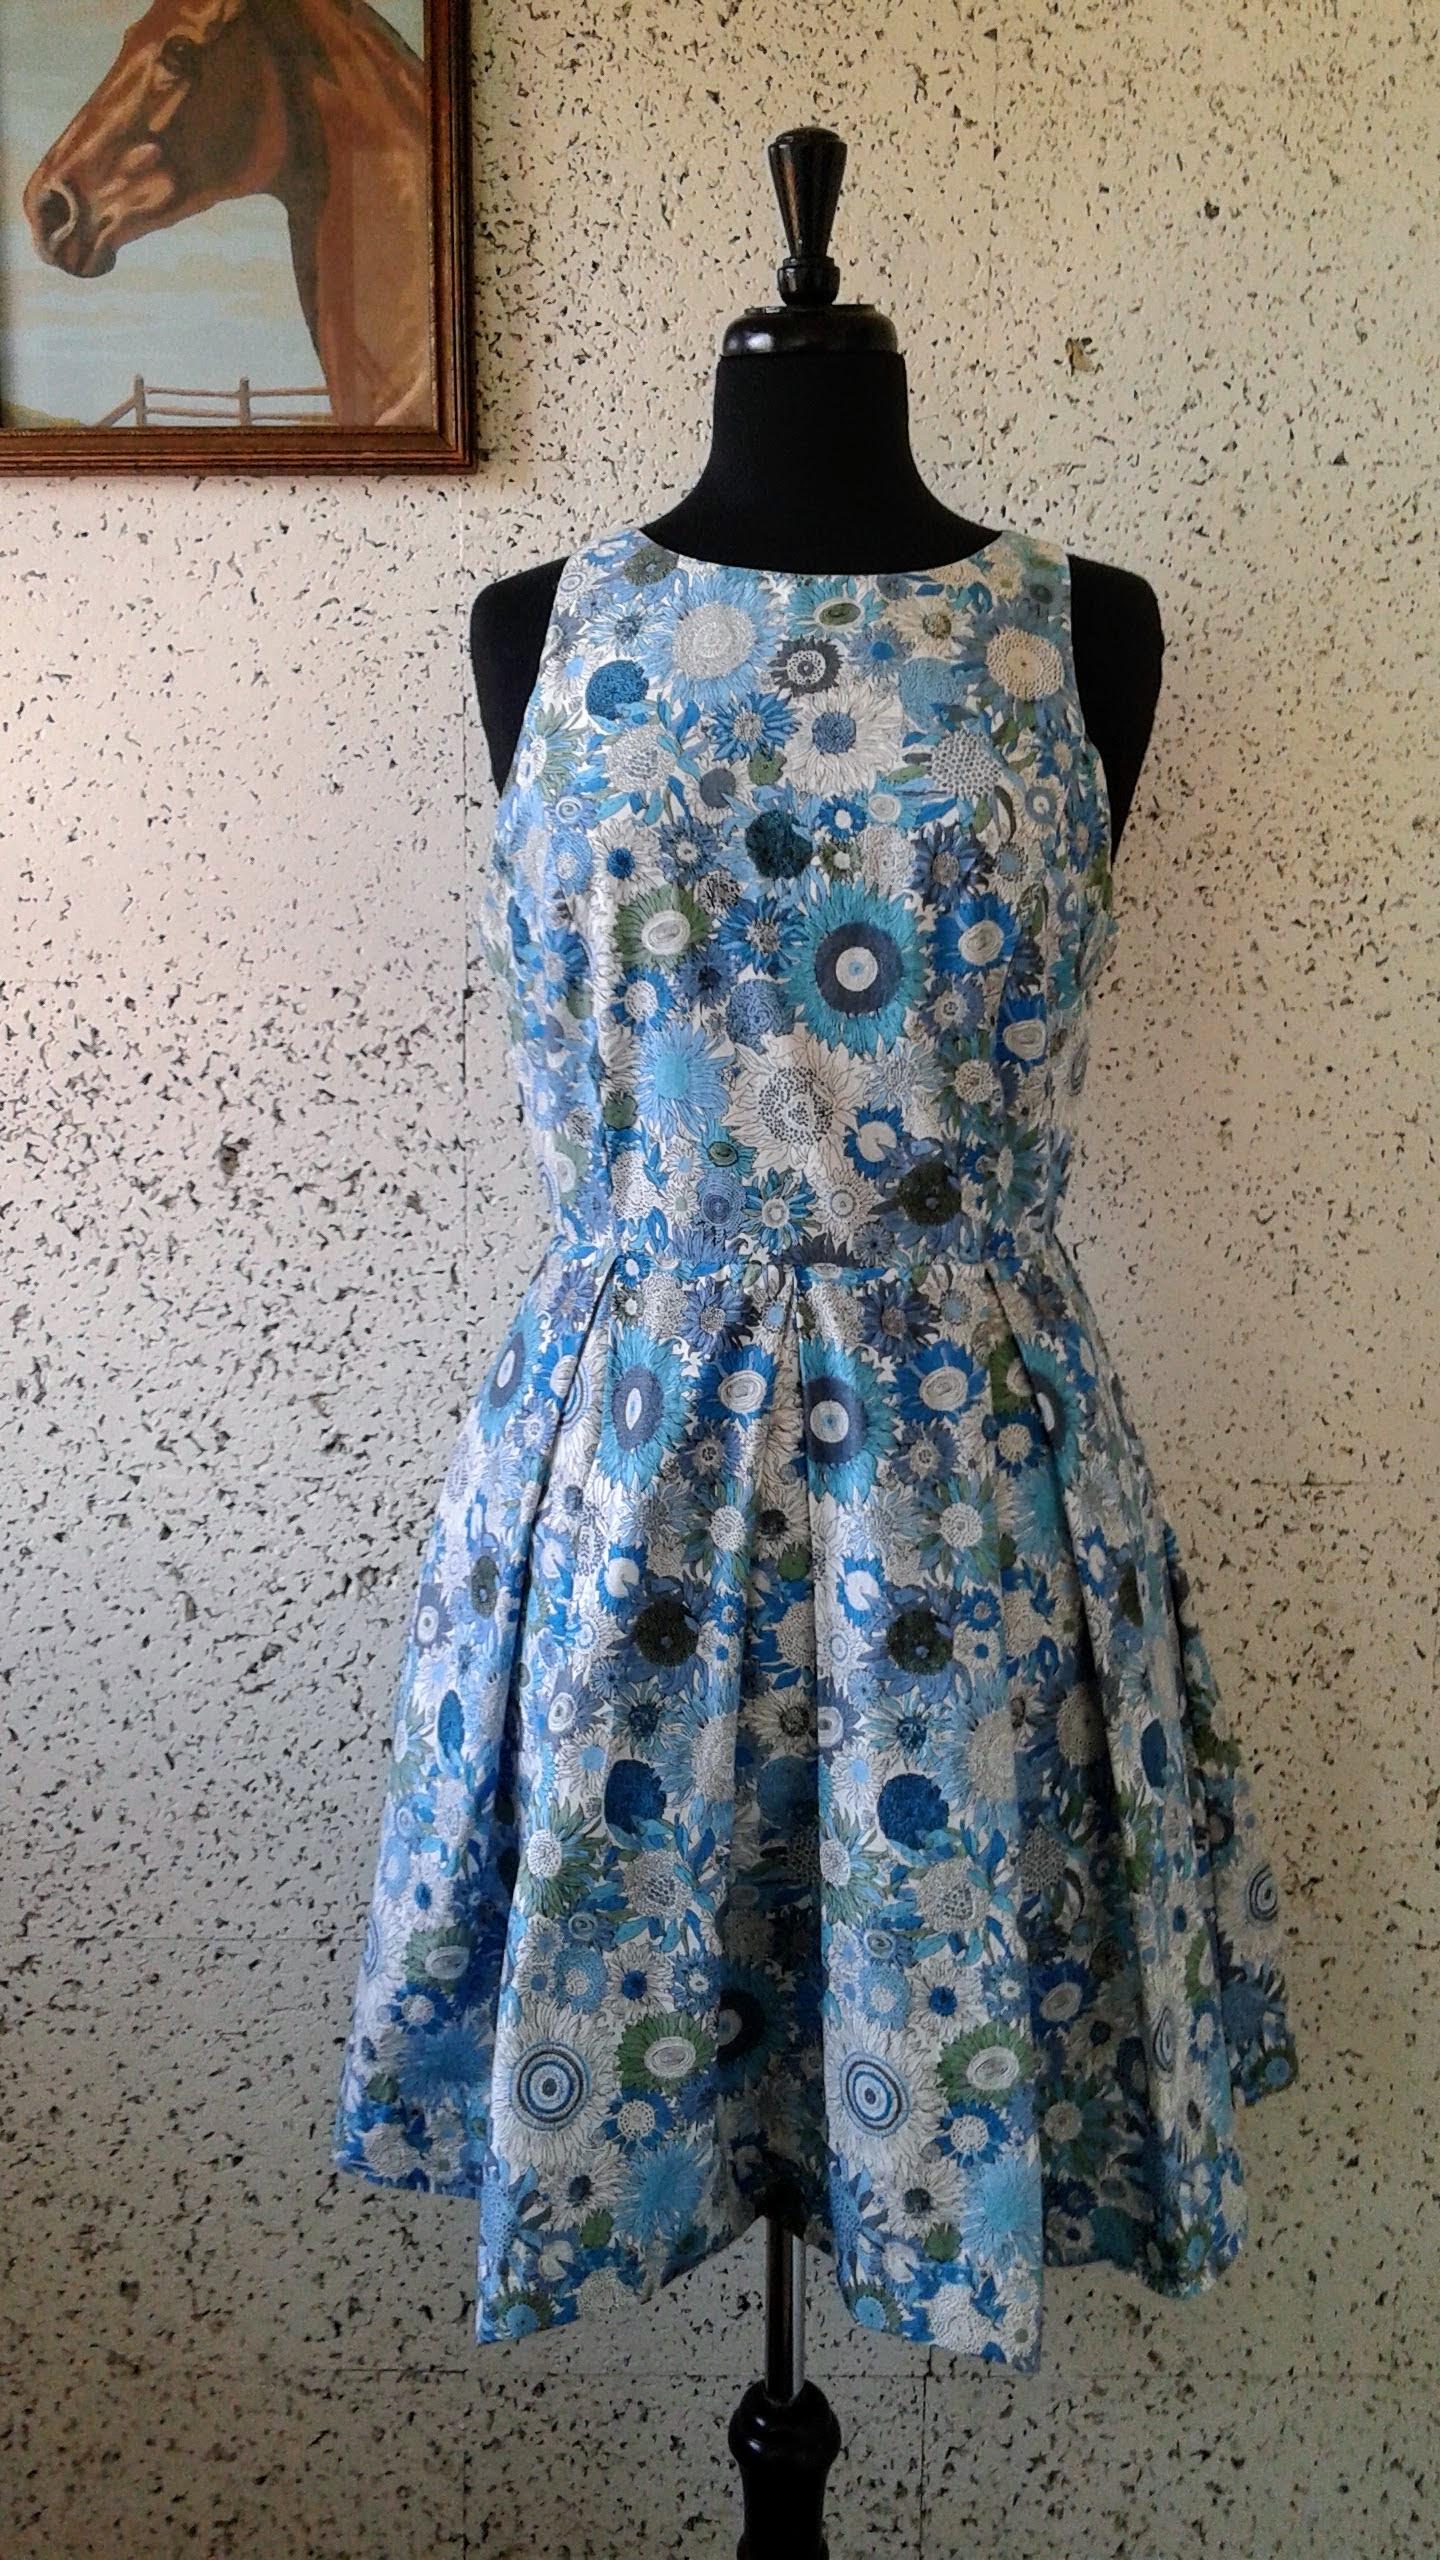 Lord & Taylor dress; Size 8, $36